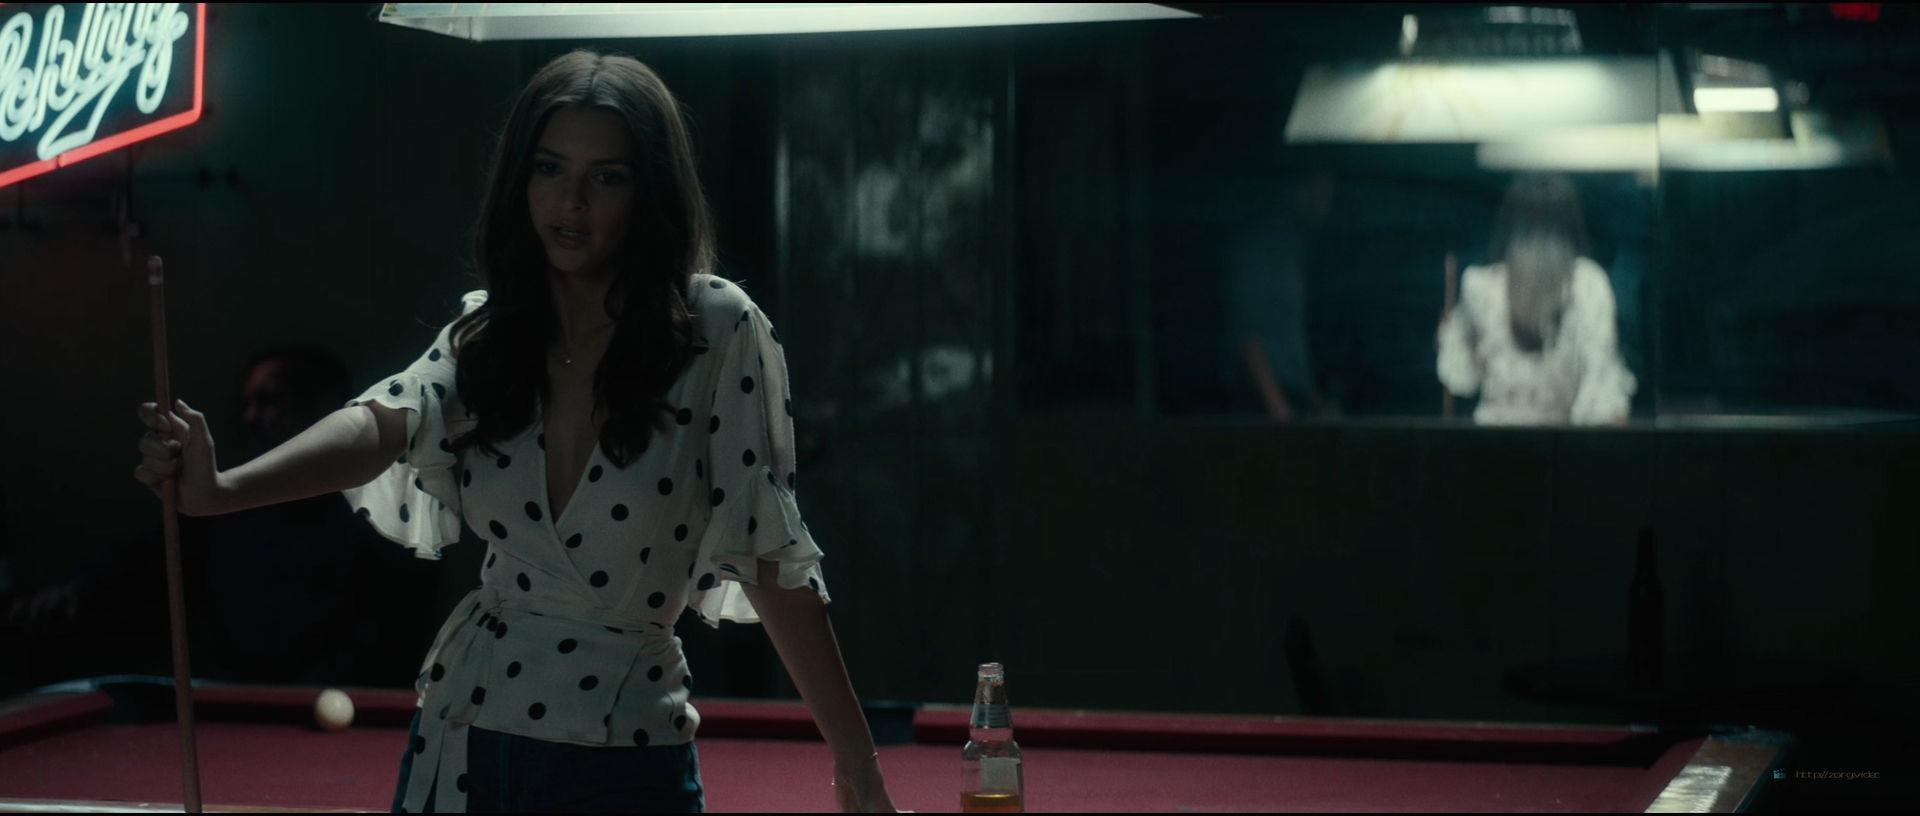 Emily Ratajkowski hot sideboob - Lying and Stealing (2019) 1080p WEB (10)